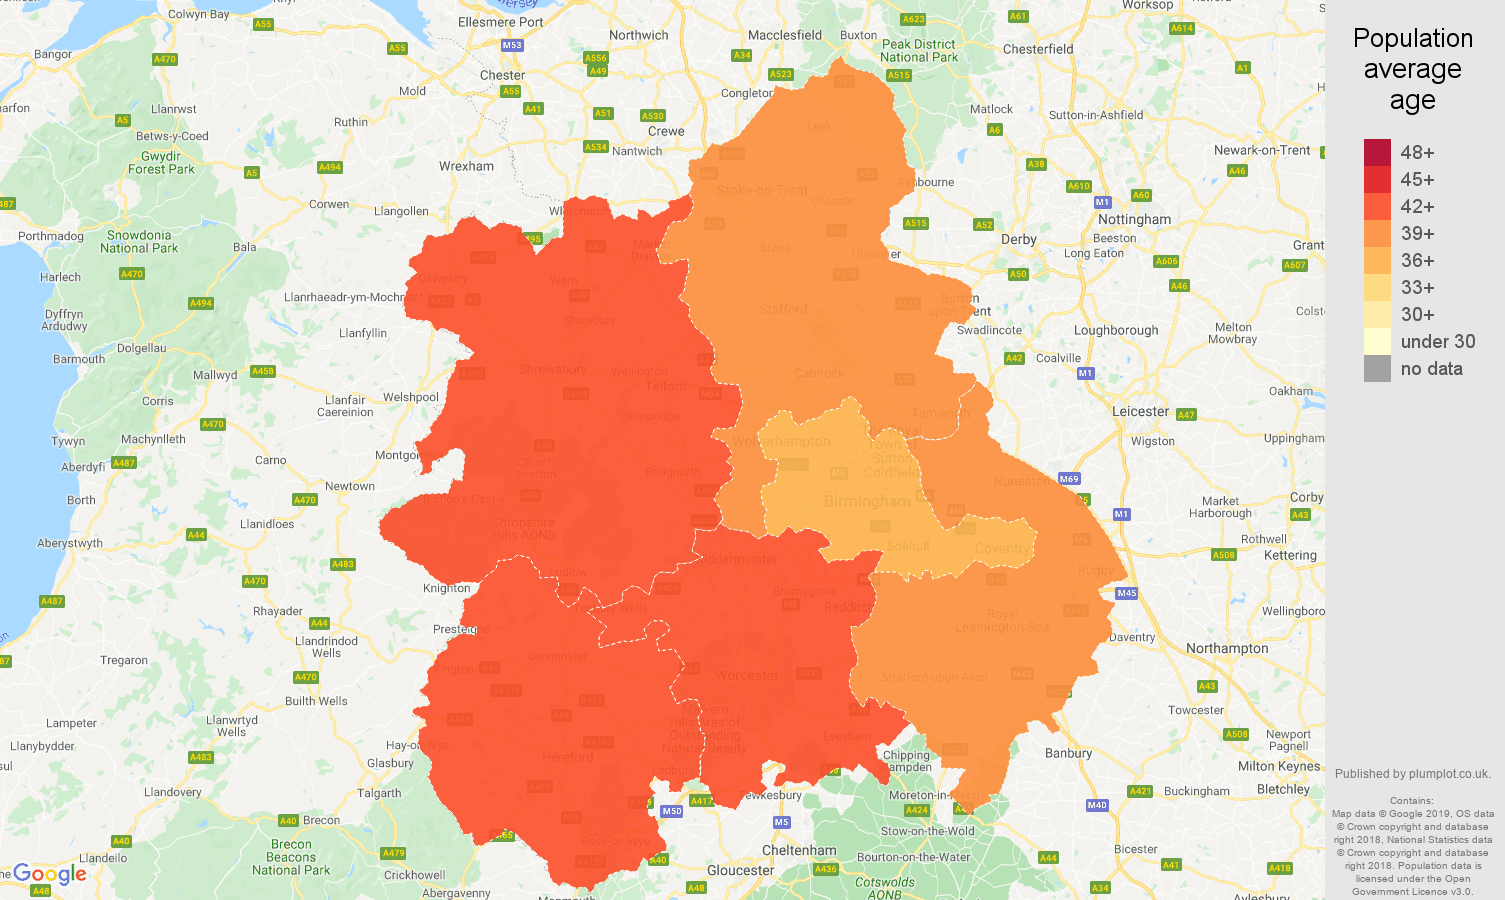 West Midlands population average age map